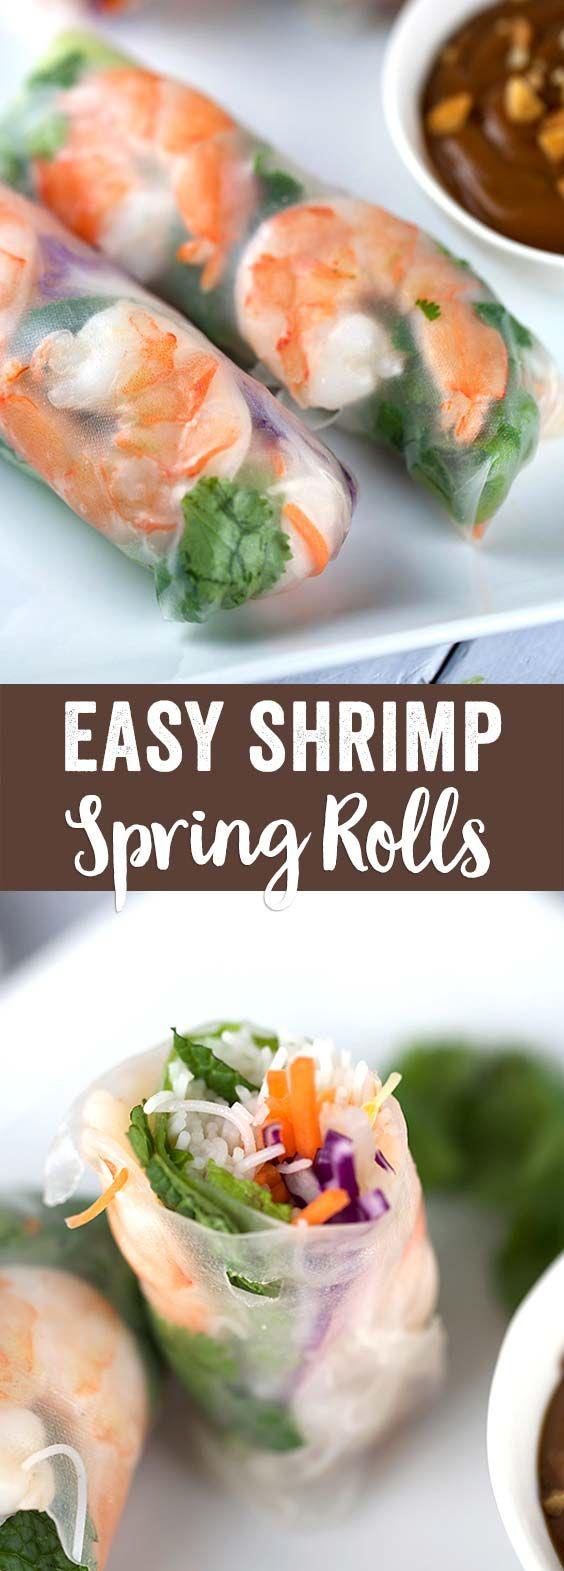 25+ best ideas about Shrimp spring rolls on Pinterest ...